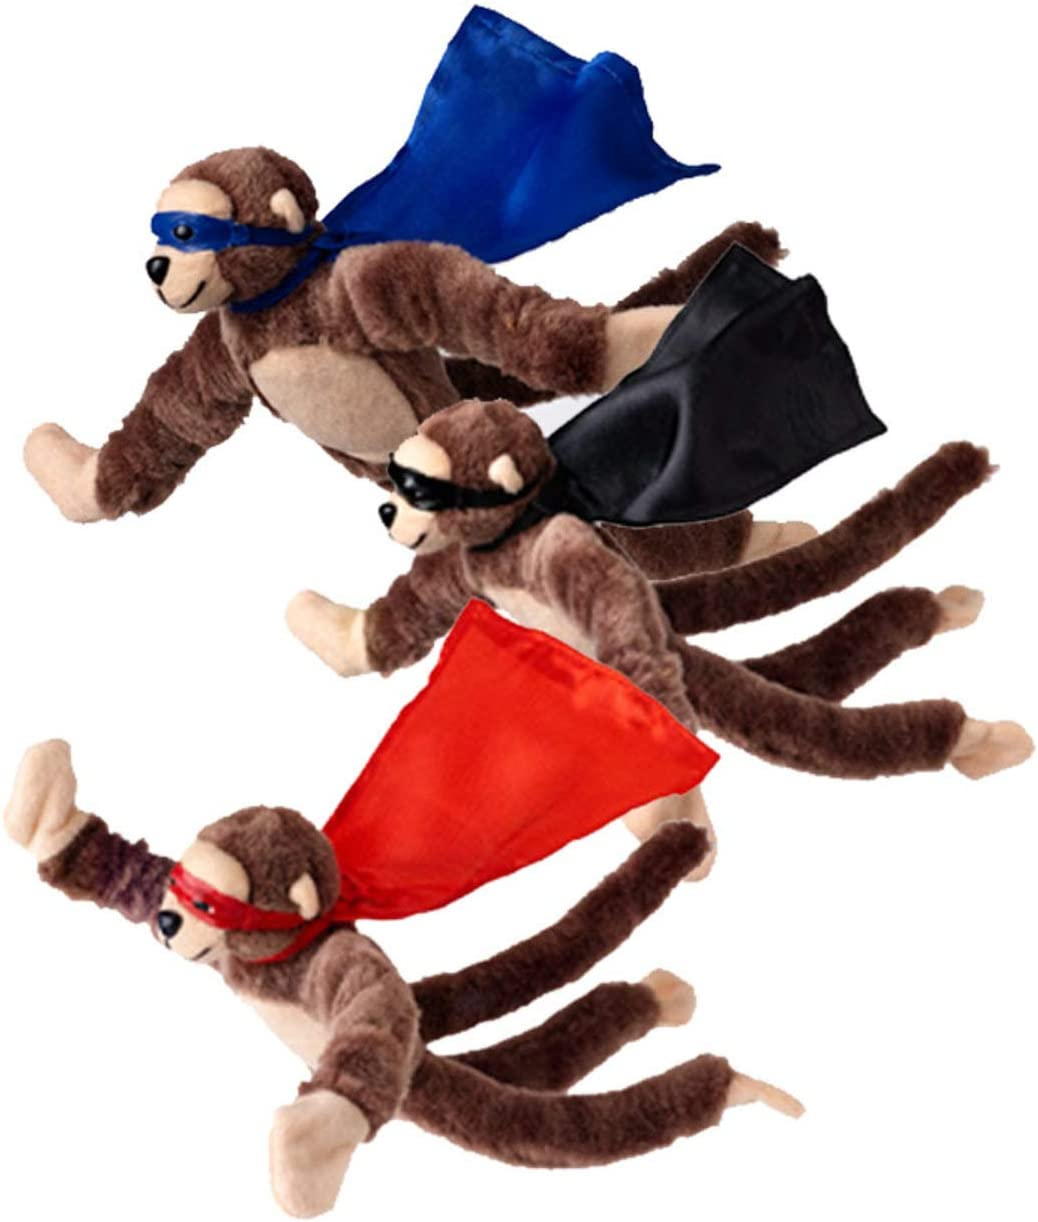 Set of 3 Flying Flingshot Howler Monkeys Plush Toys with Sound, 11.5''H